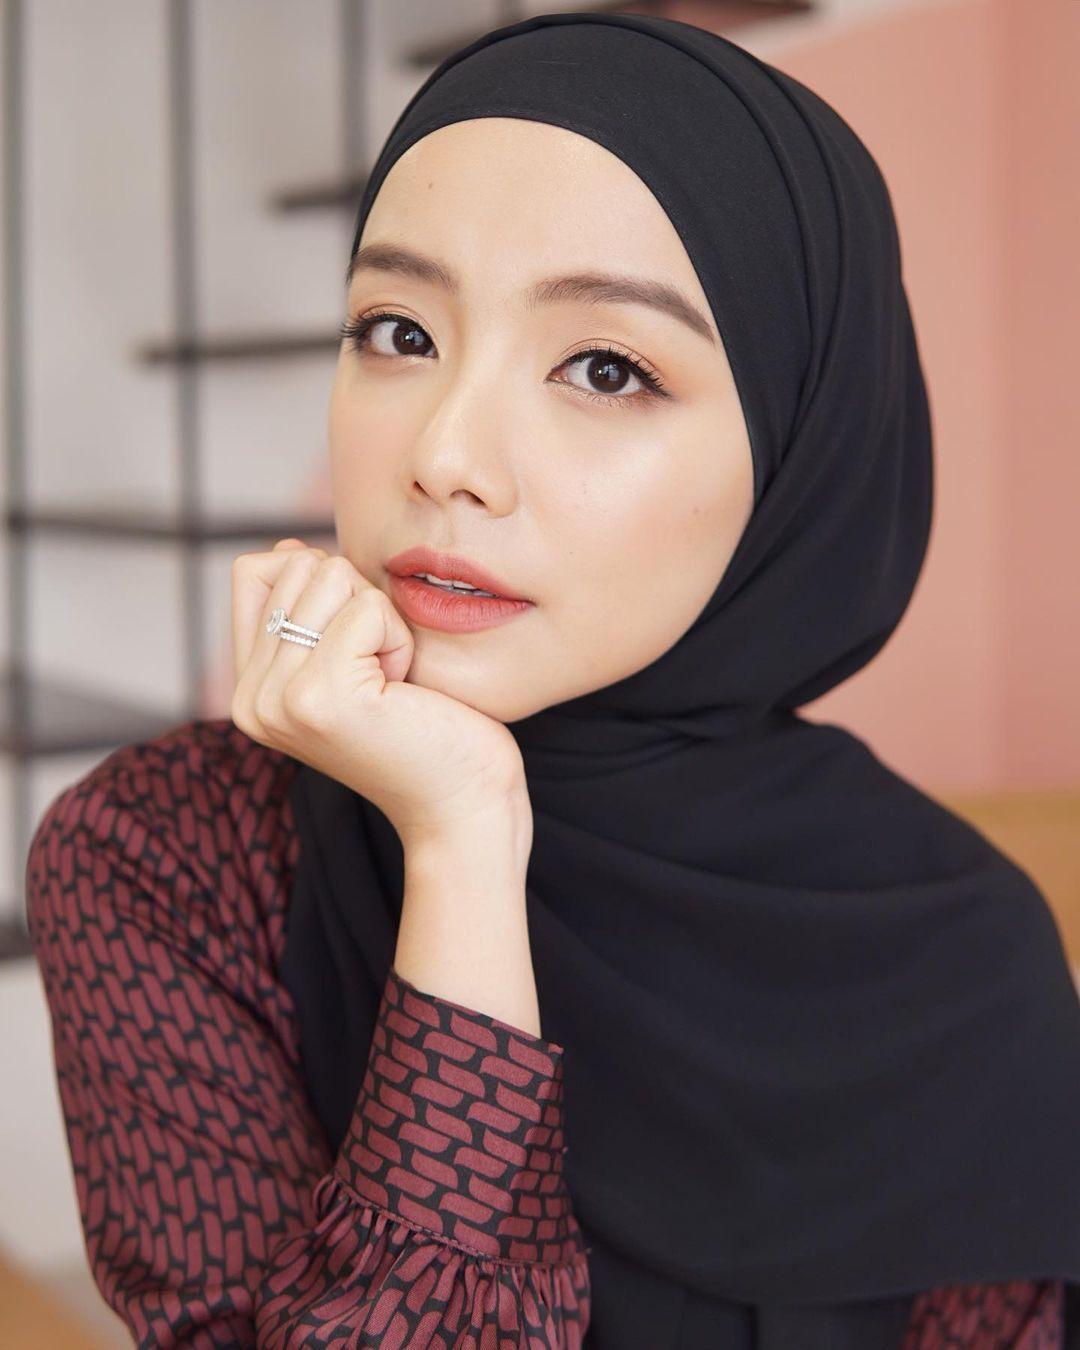 Tercalon Dalam Enam Kategori Anugerah Bintang Popular Berita Harian Ke-33, Mira Filzah Akui Tidak Tertekan Untuk Menang 3